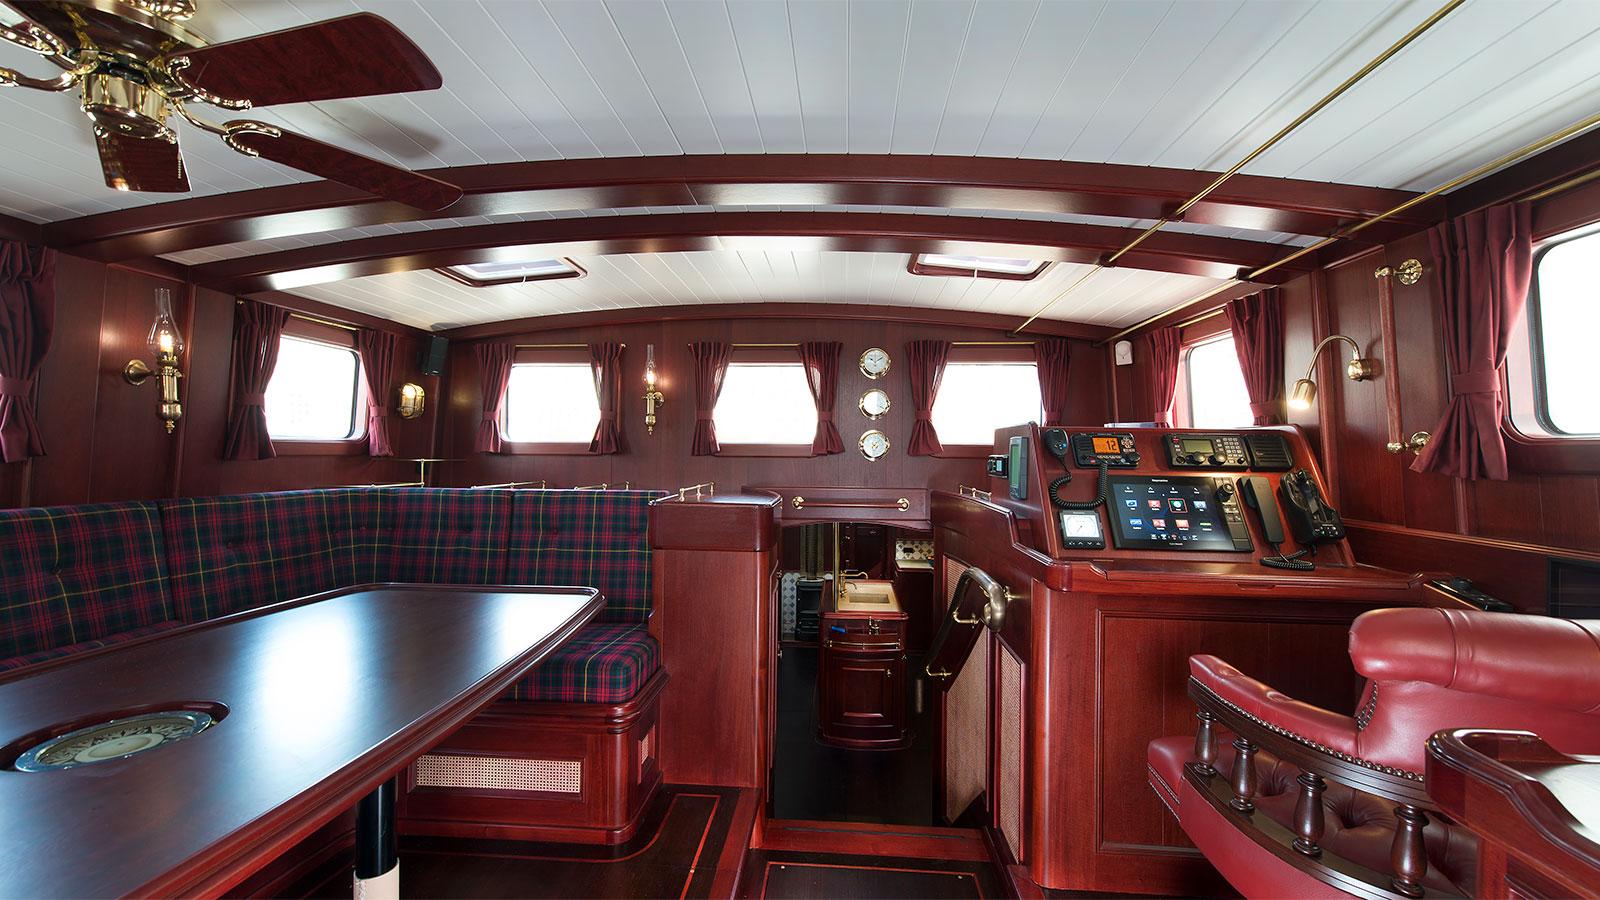 the-wheelhouse-of-the-gaff-rigged-sailing-superyacht-spirit-of-venice-credit-olivier-van-meer-vmg-yachtbuilders